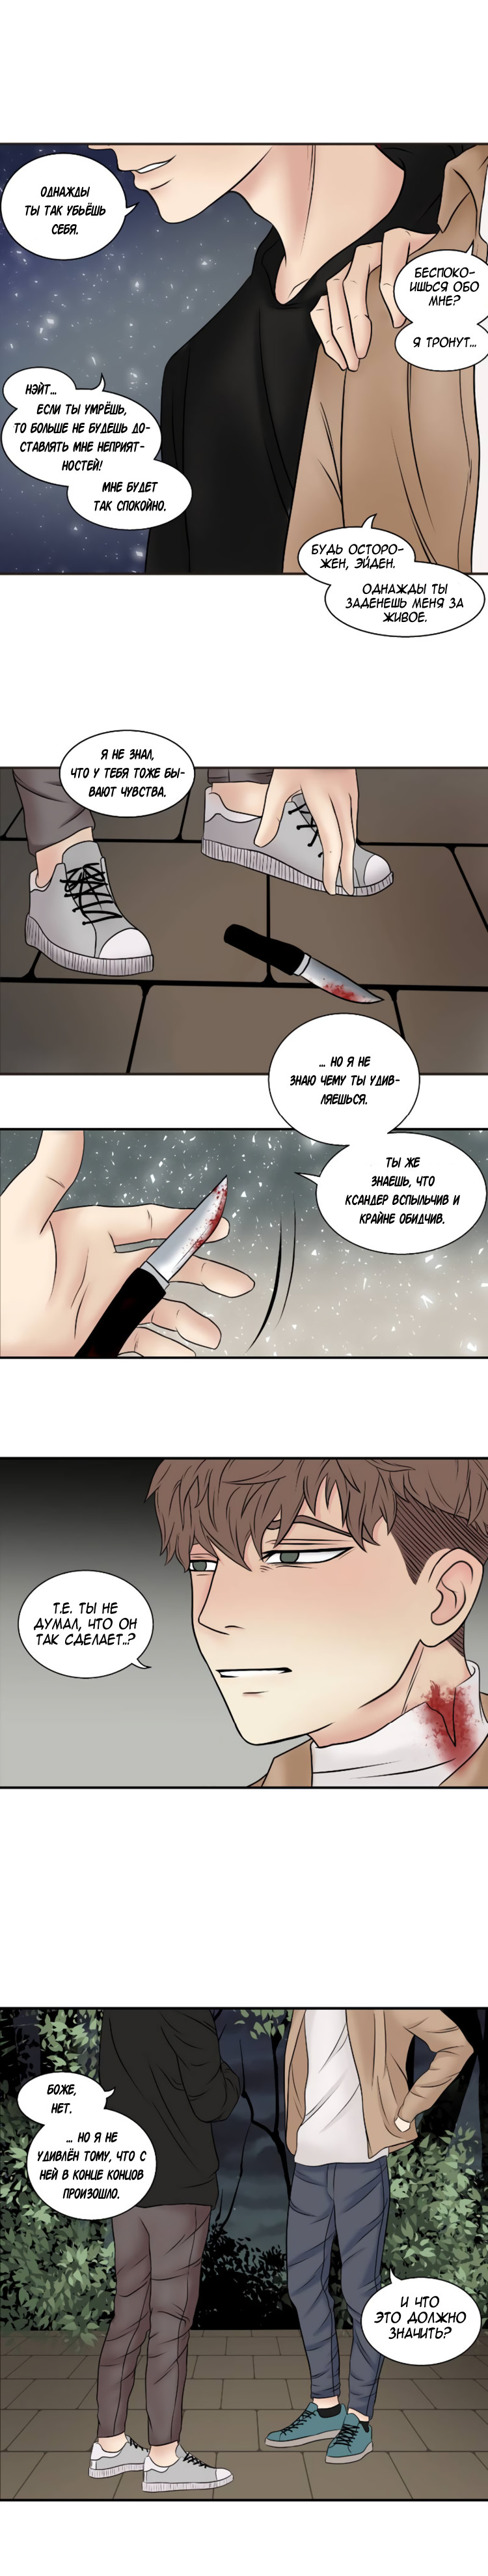 https://r2.ninemanga.com/comics/pic3/21/33557/1298592/154697498986.jpg Page 2